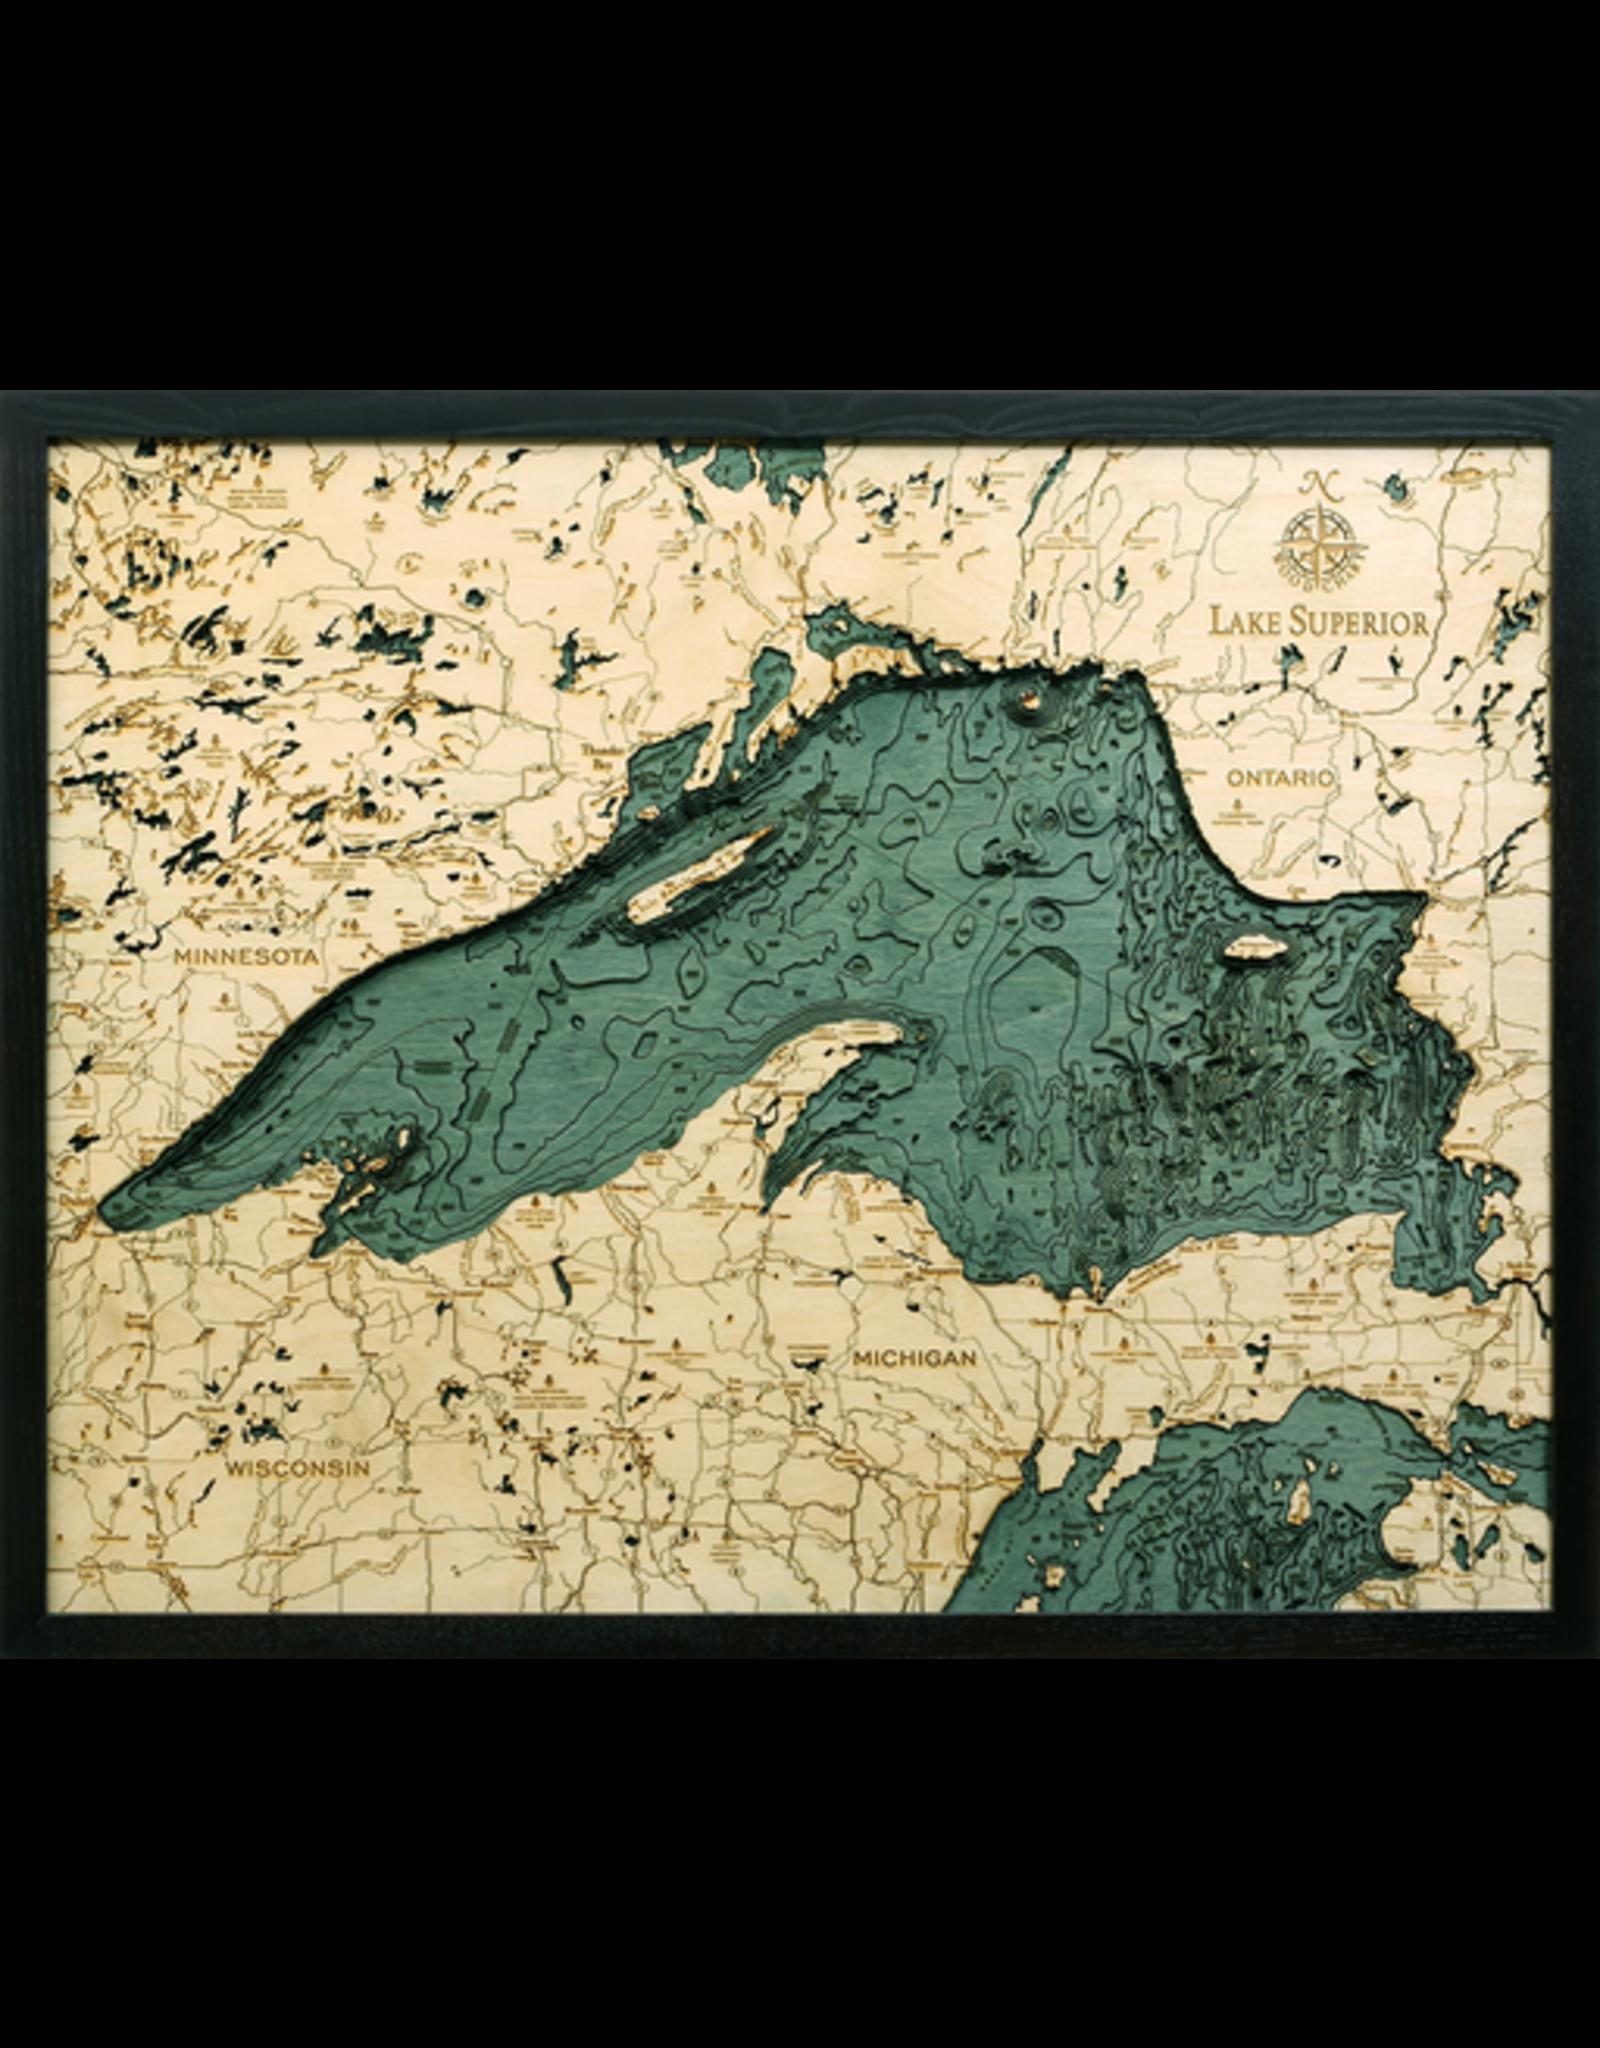 WoodCharts Lake Superior (Bathymetric 3-D Nautical WOODCHART)